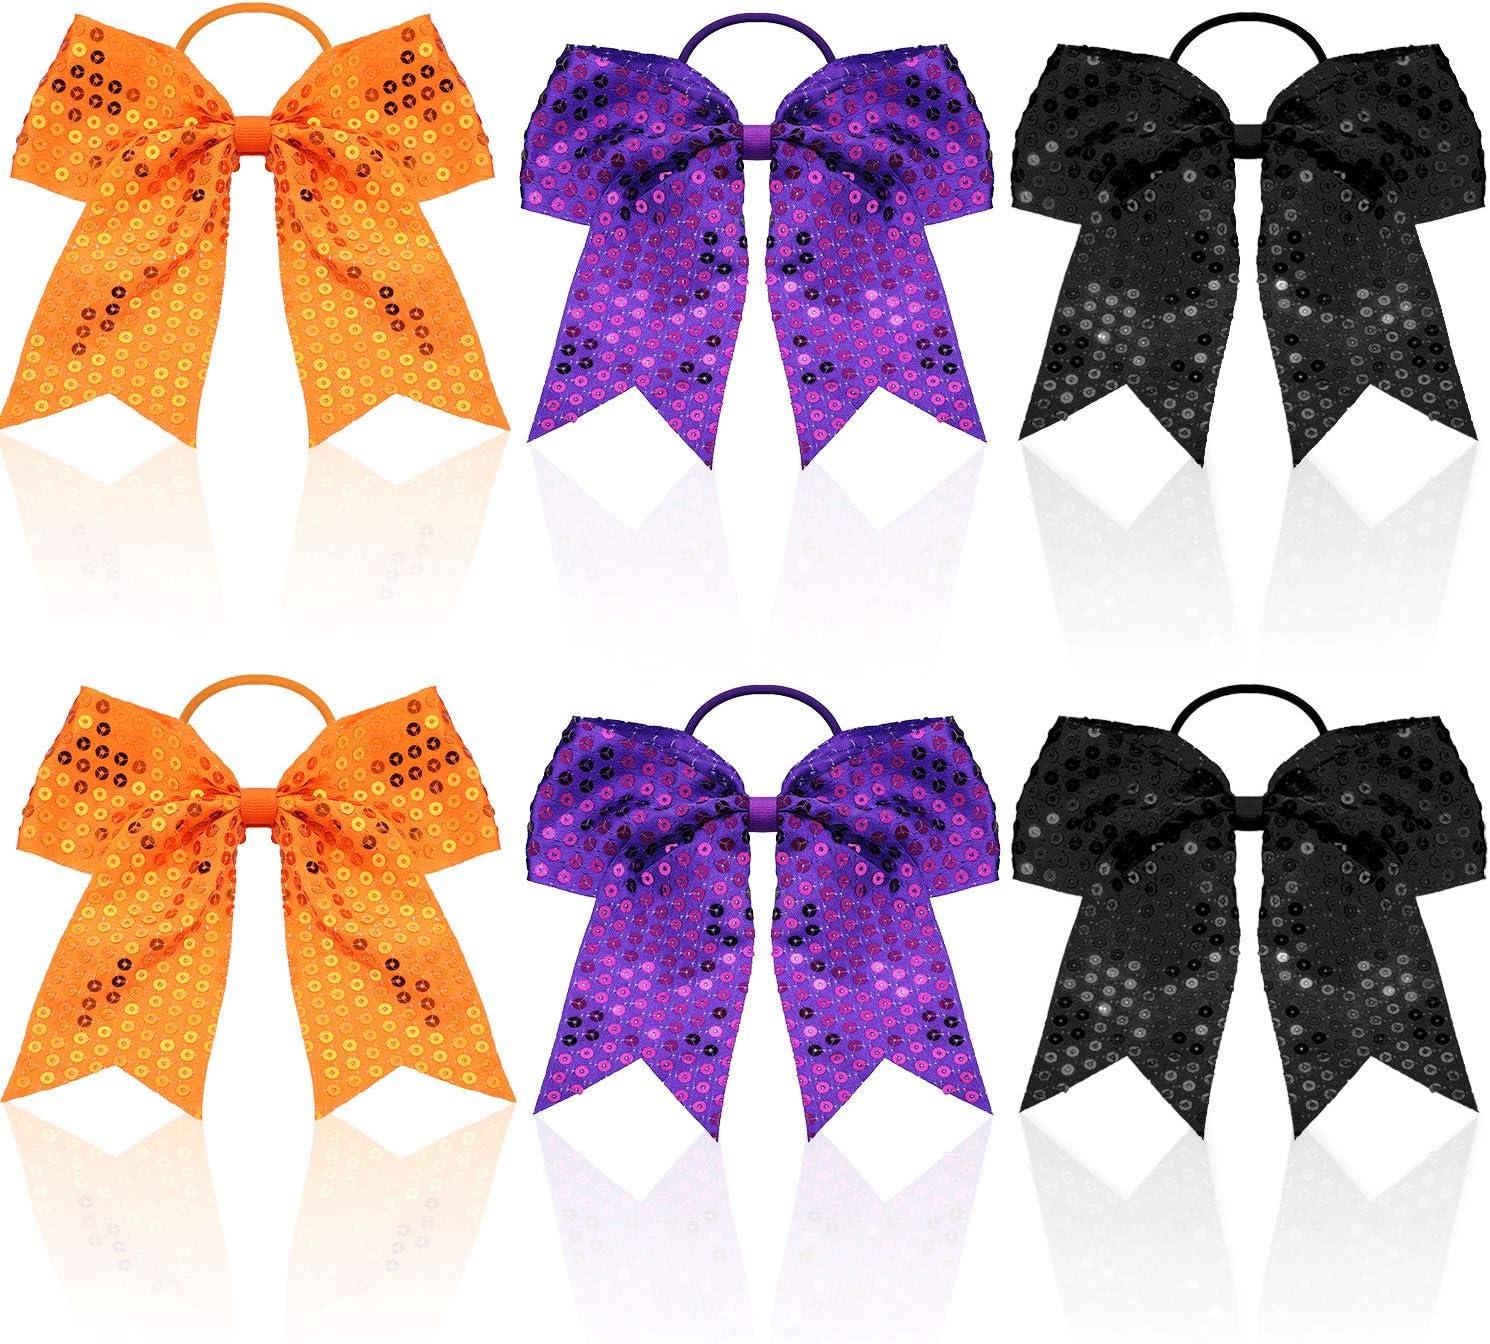 6 Piezas Lazos de Cabello de Animadora Brillantes de Halloween Soporte de Cola de Caballo con Lentejuelas Grandes para Mujeres Niñas Decoración de Disfraces de Halloween, 3 Colores